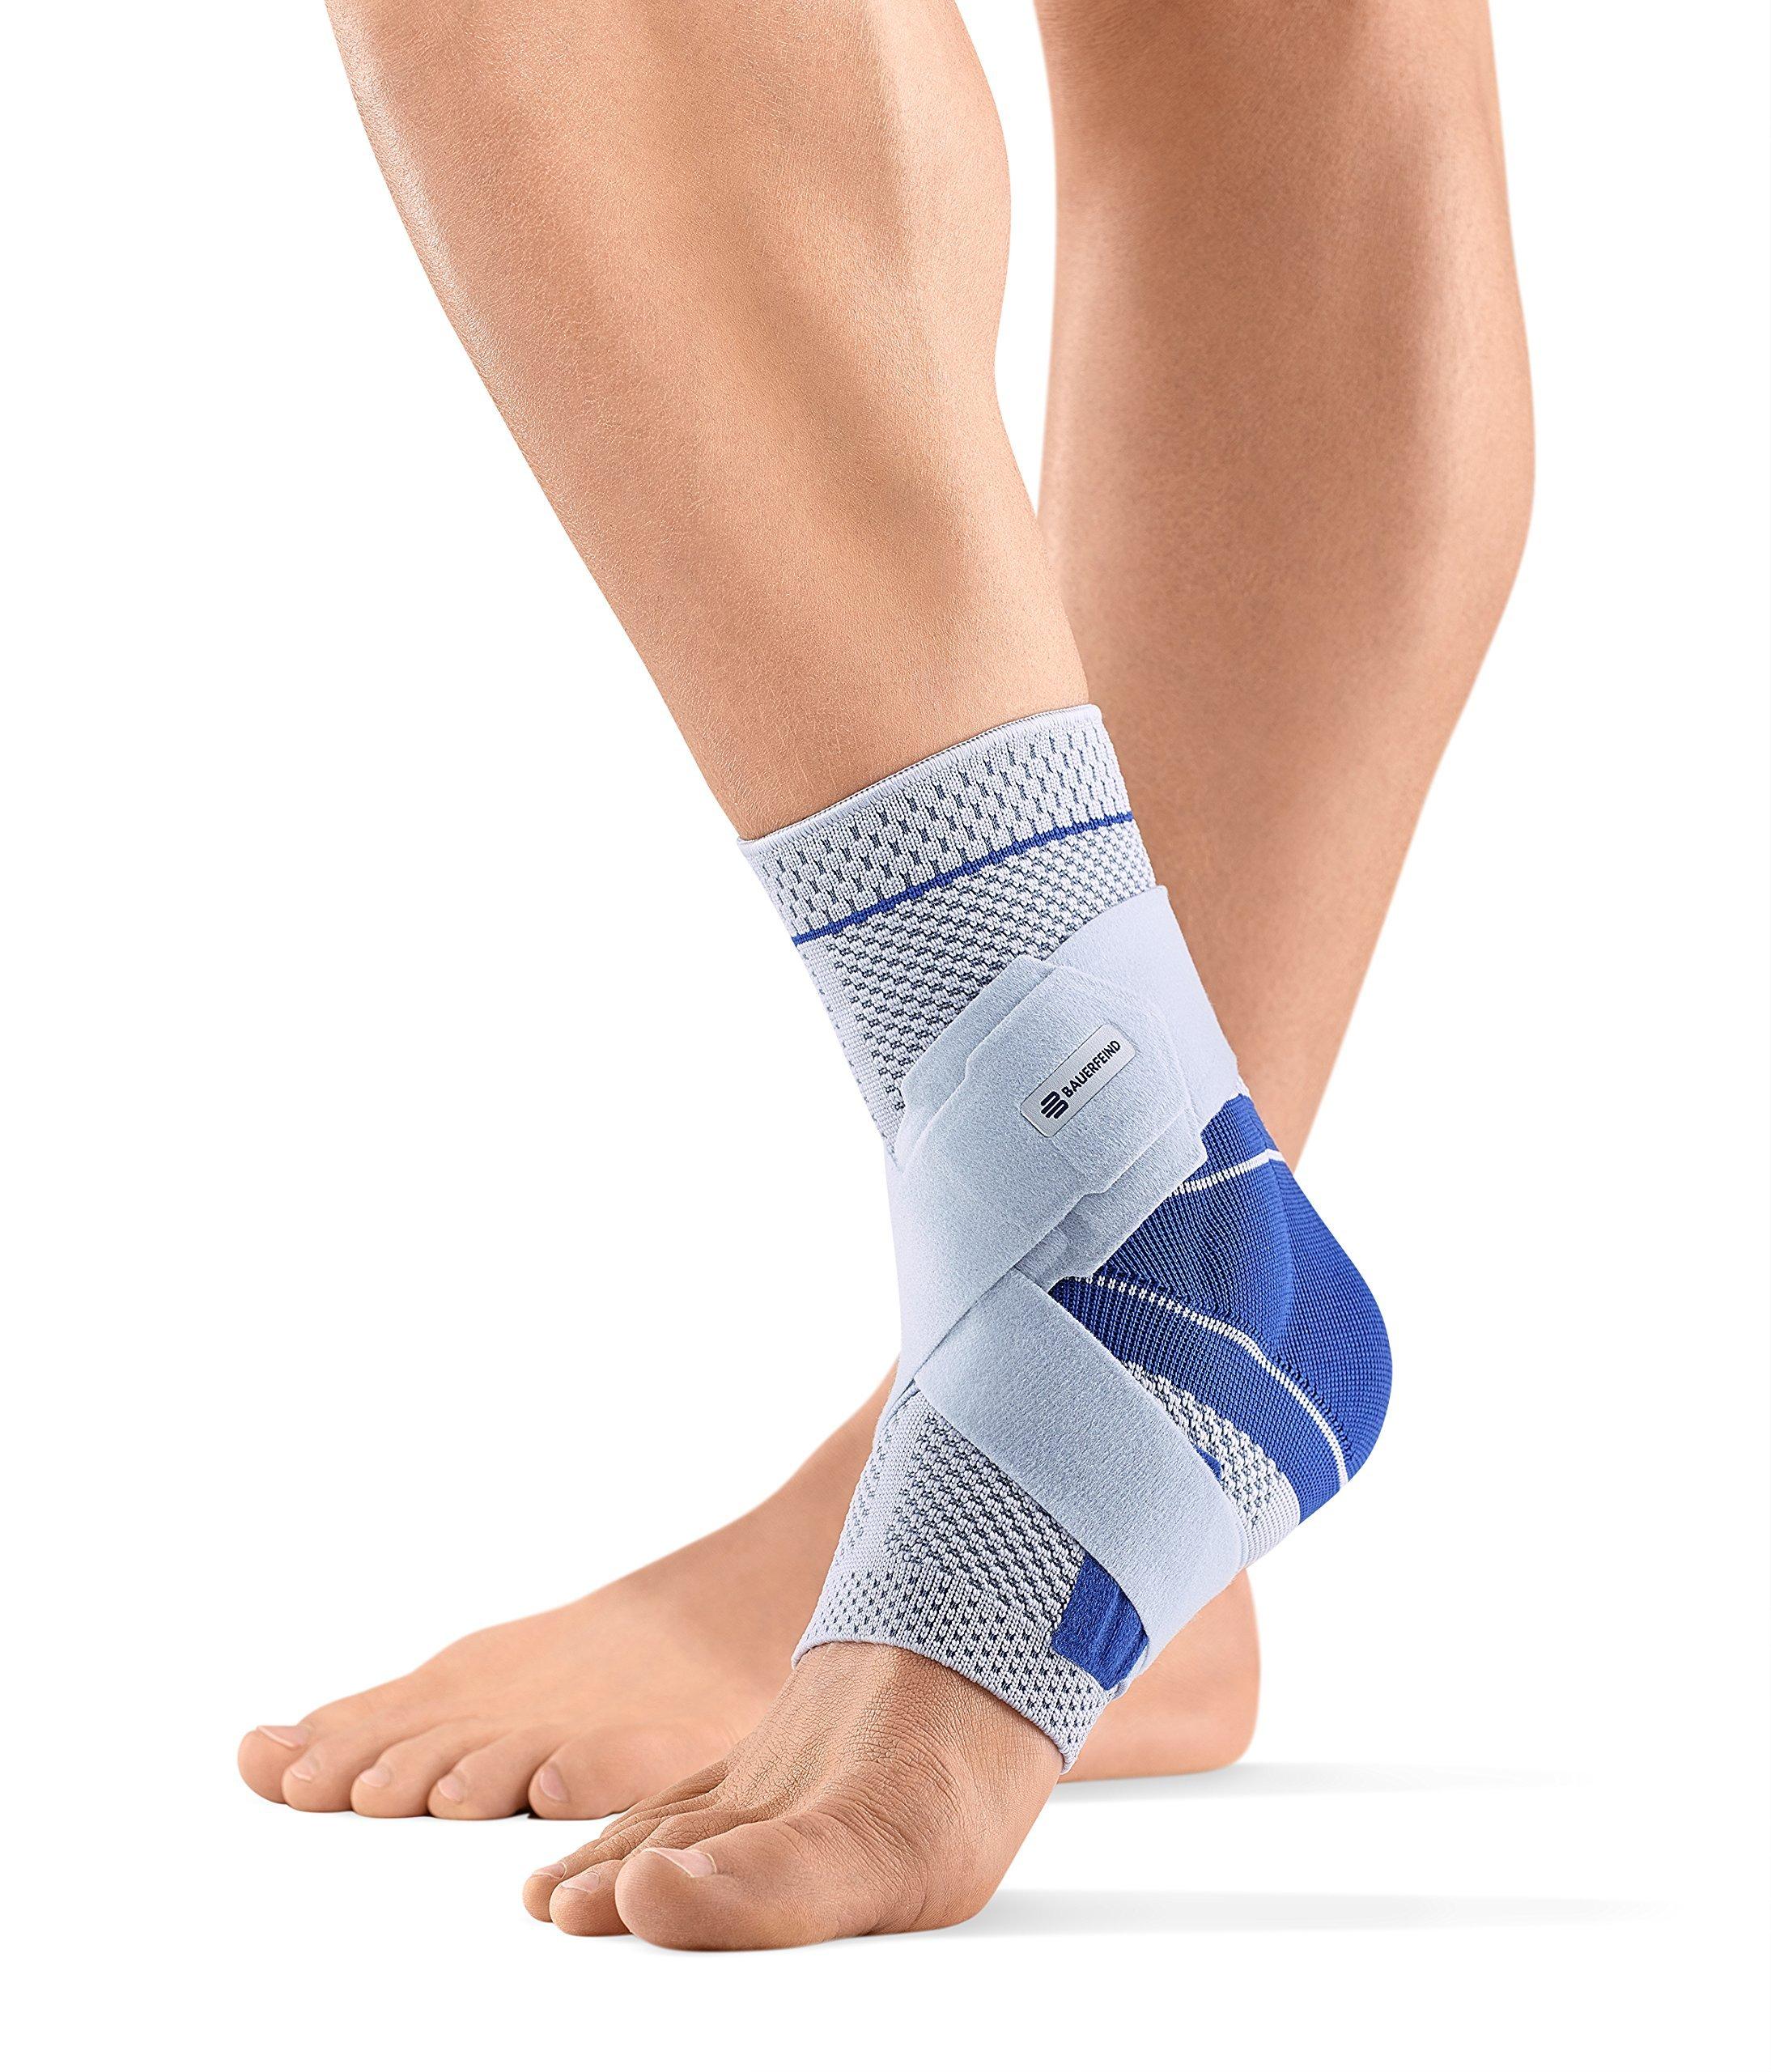 Bauerfeind MalleoTrain Plus Ankle Support - Titanium (Right,2)